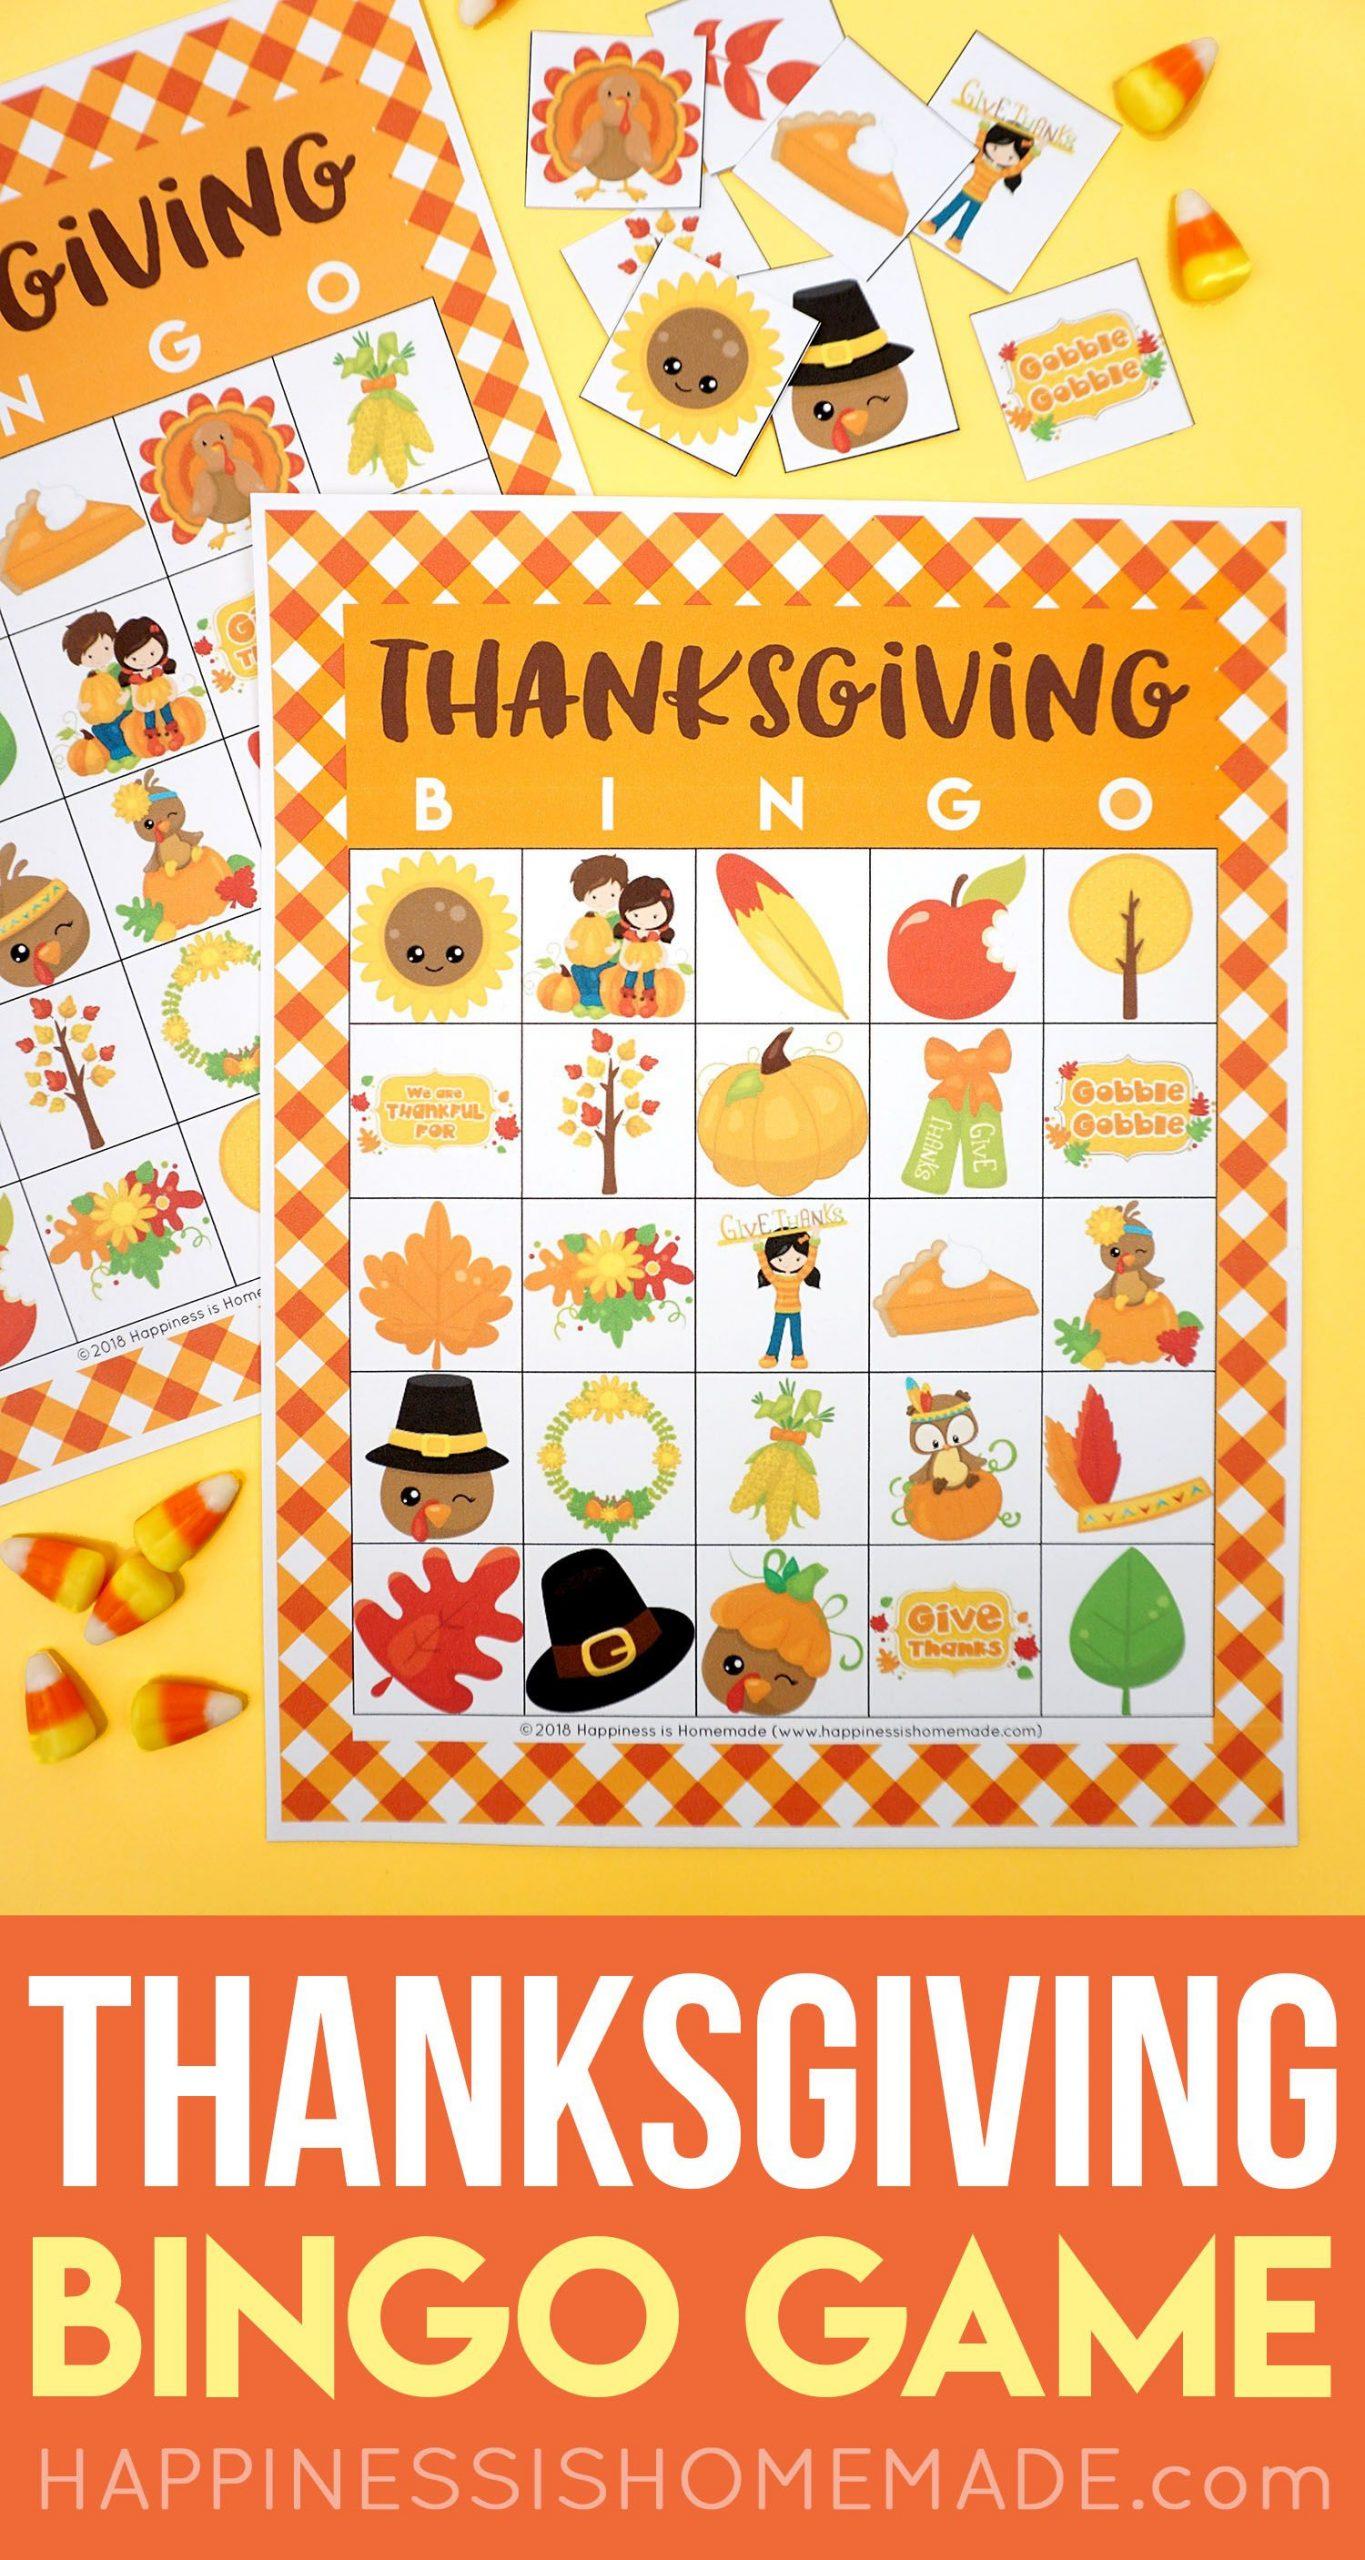 Printable Thanksgiving Bingo Cards - This Thanksgiving Bingo